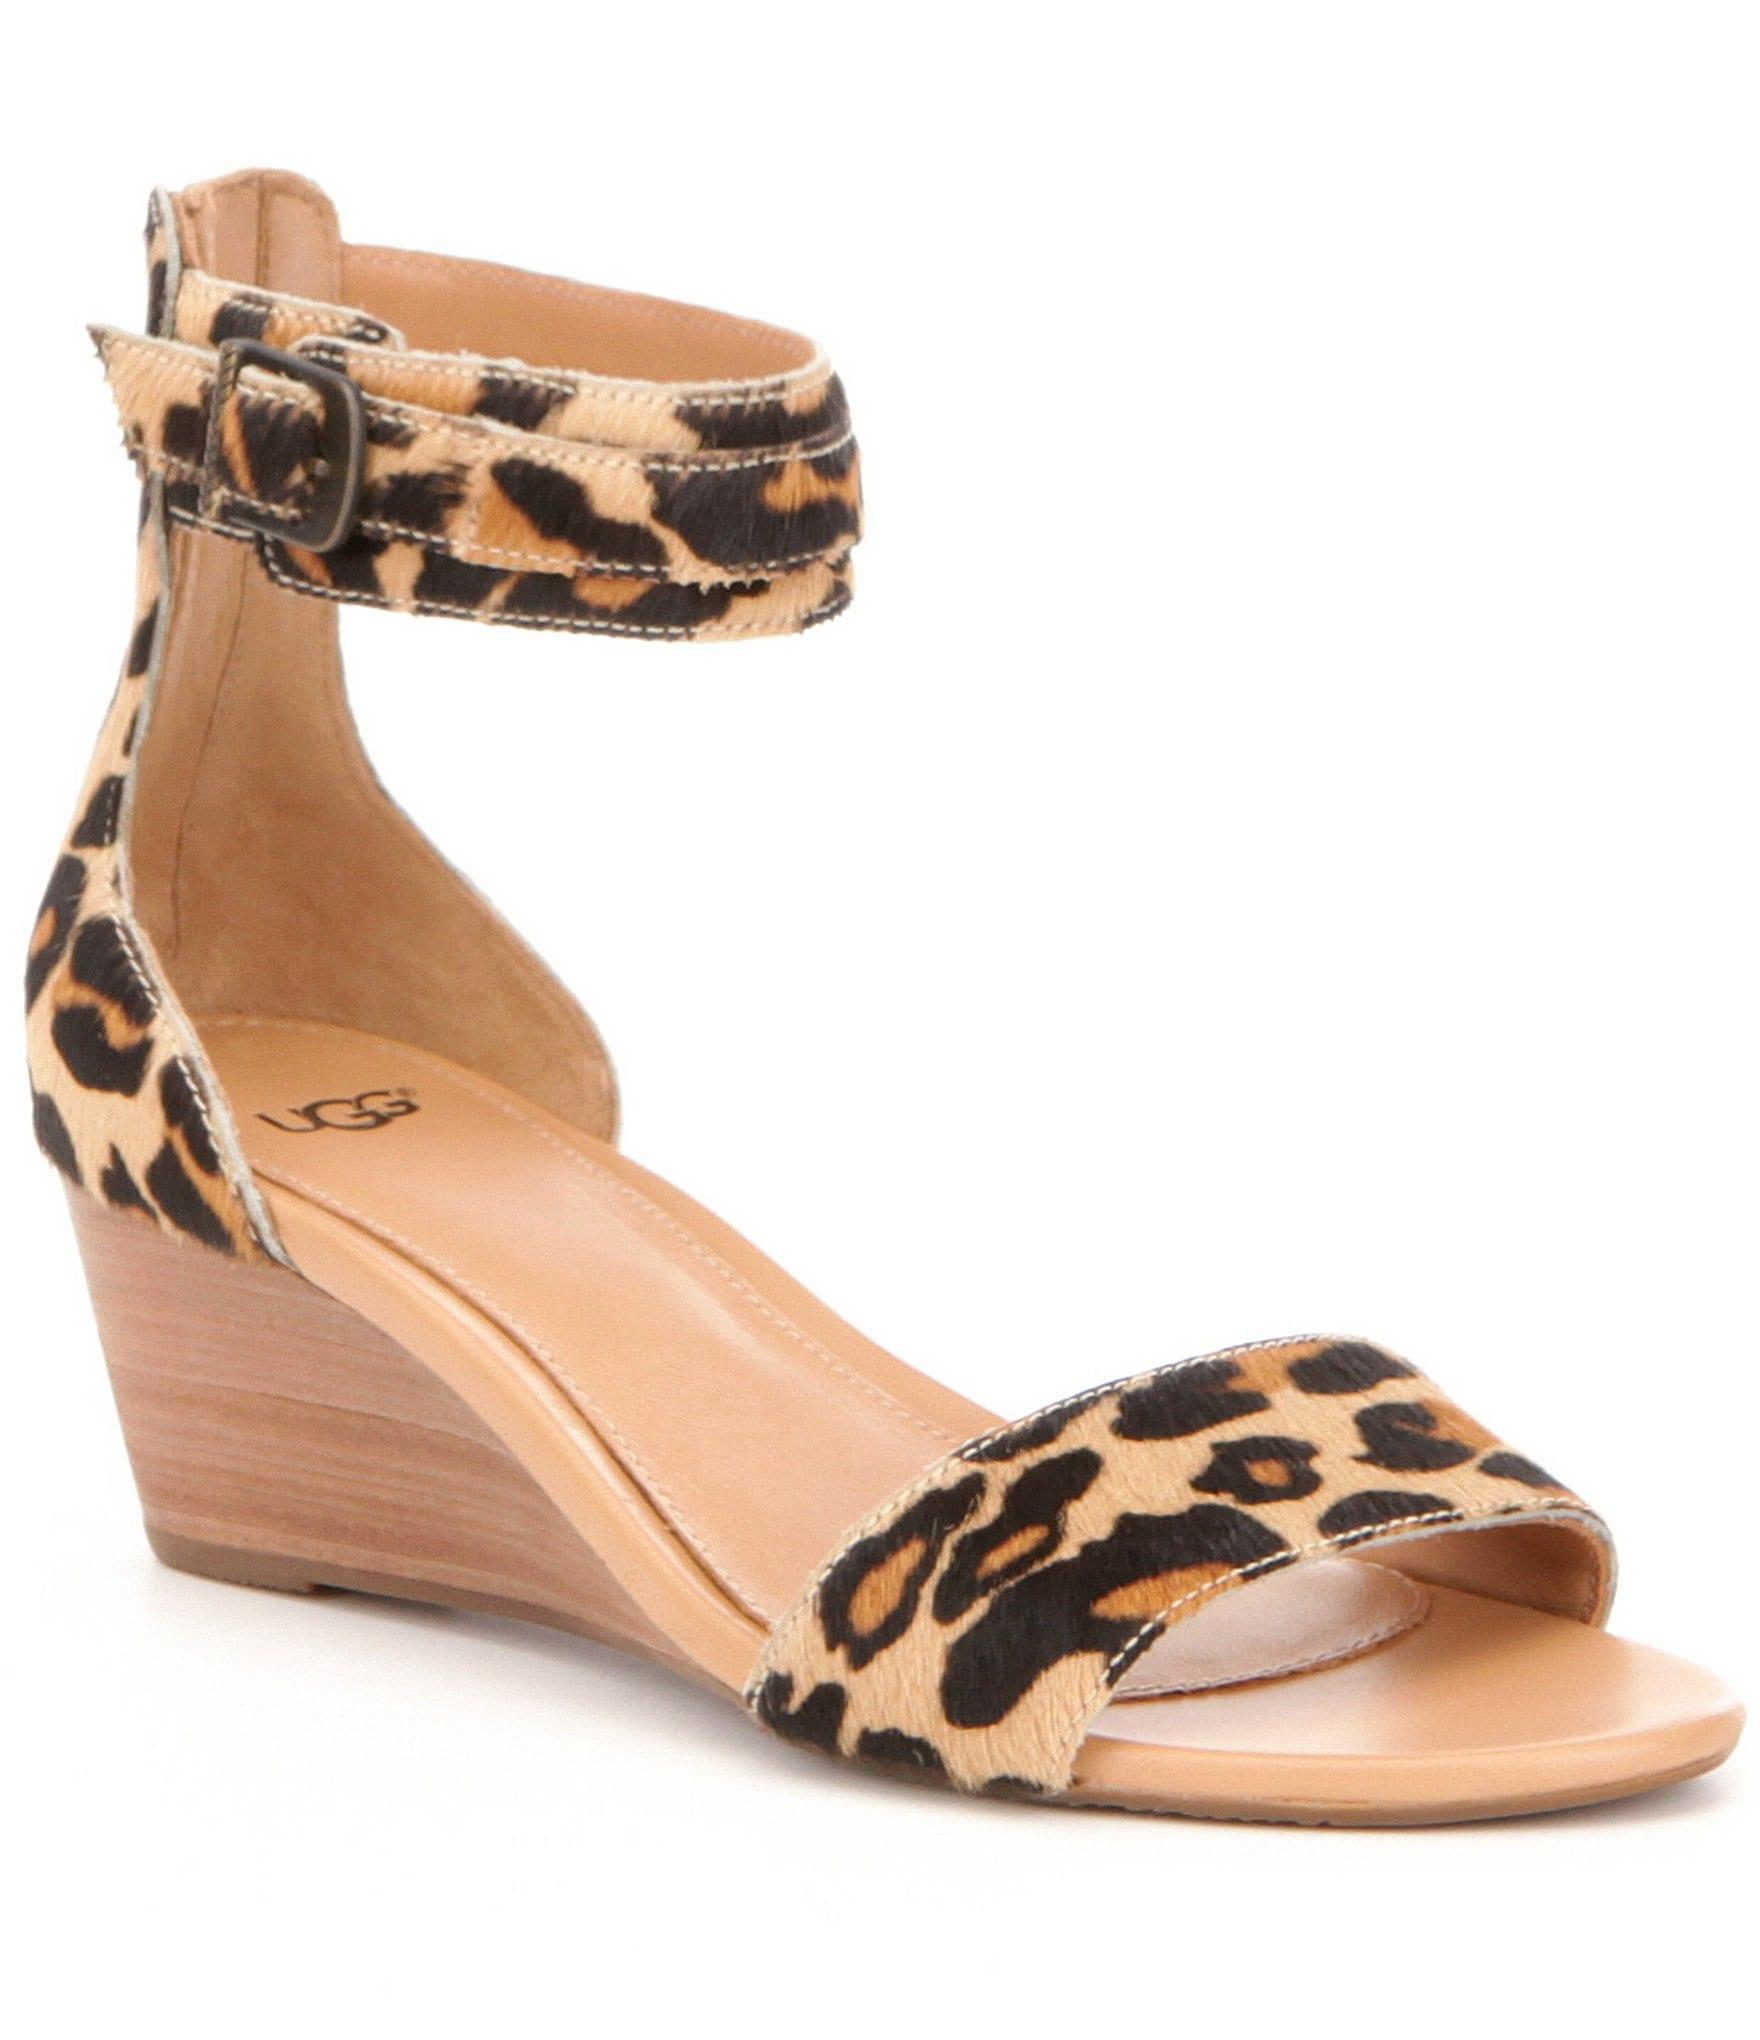 Ugg 174 Char Leopard Calf Hair Wedge Sandals Dillards